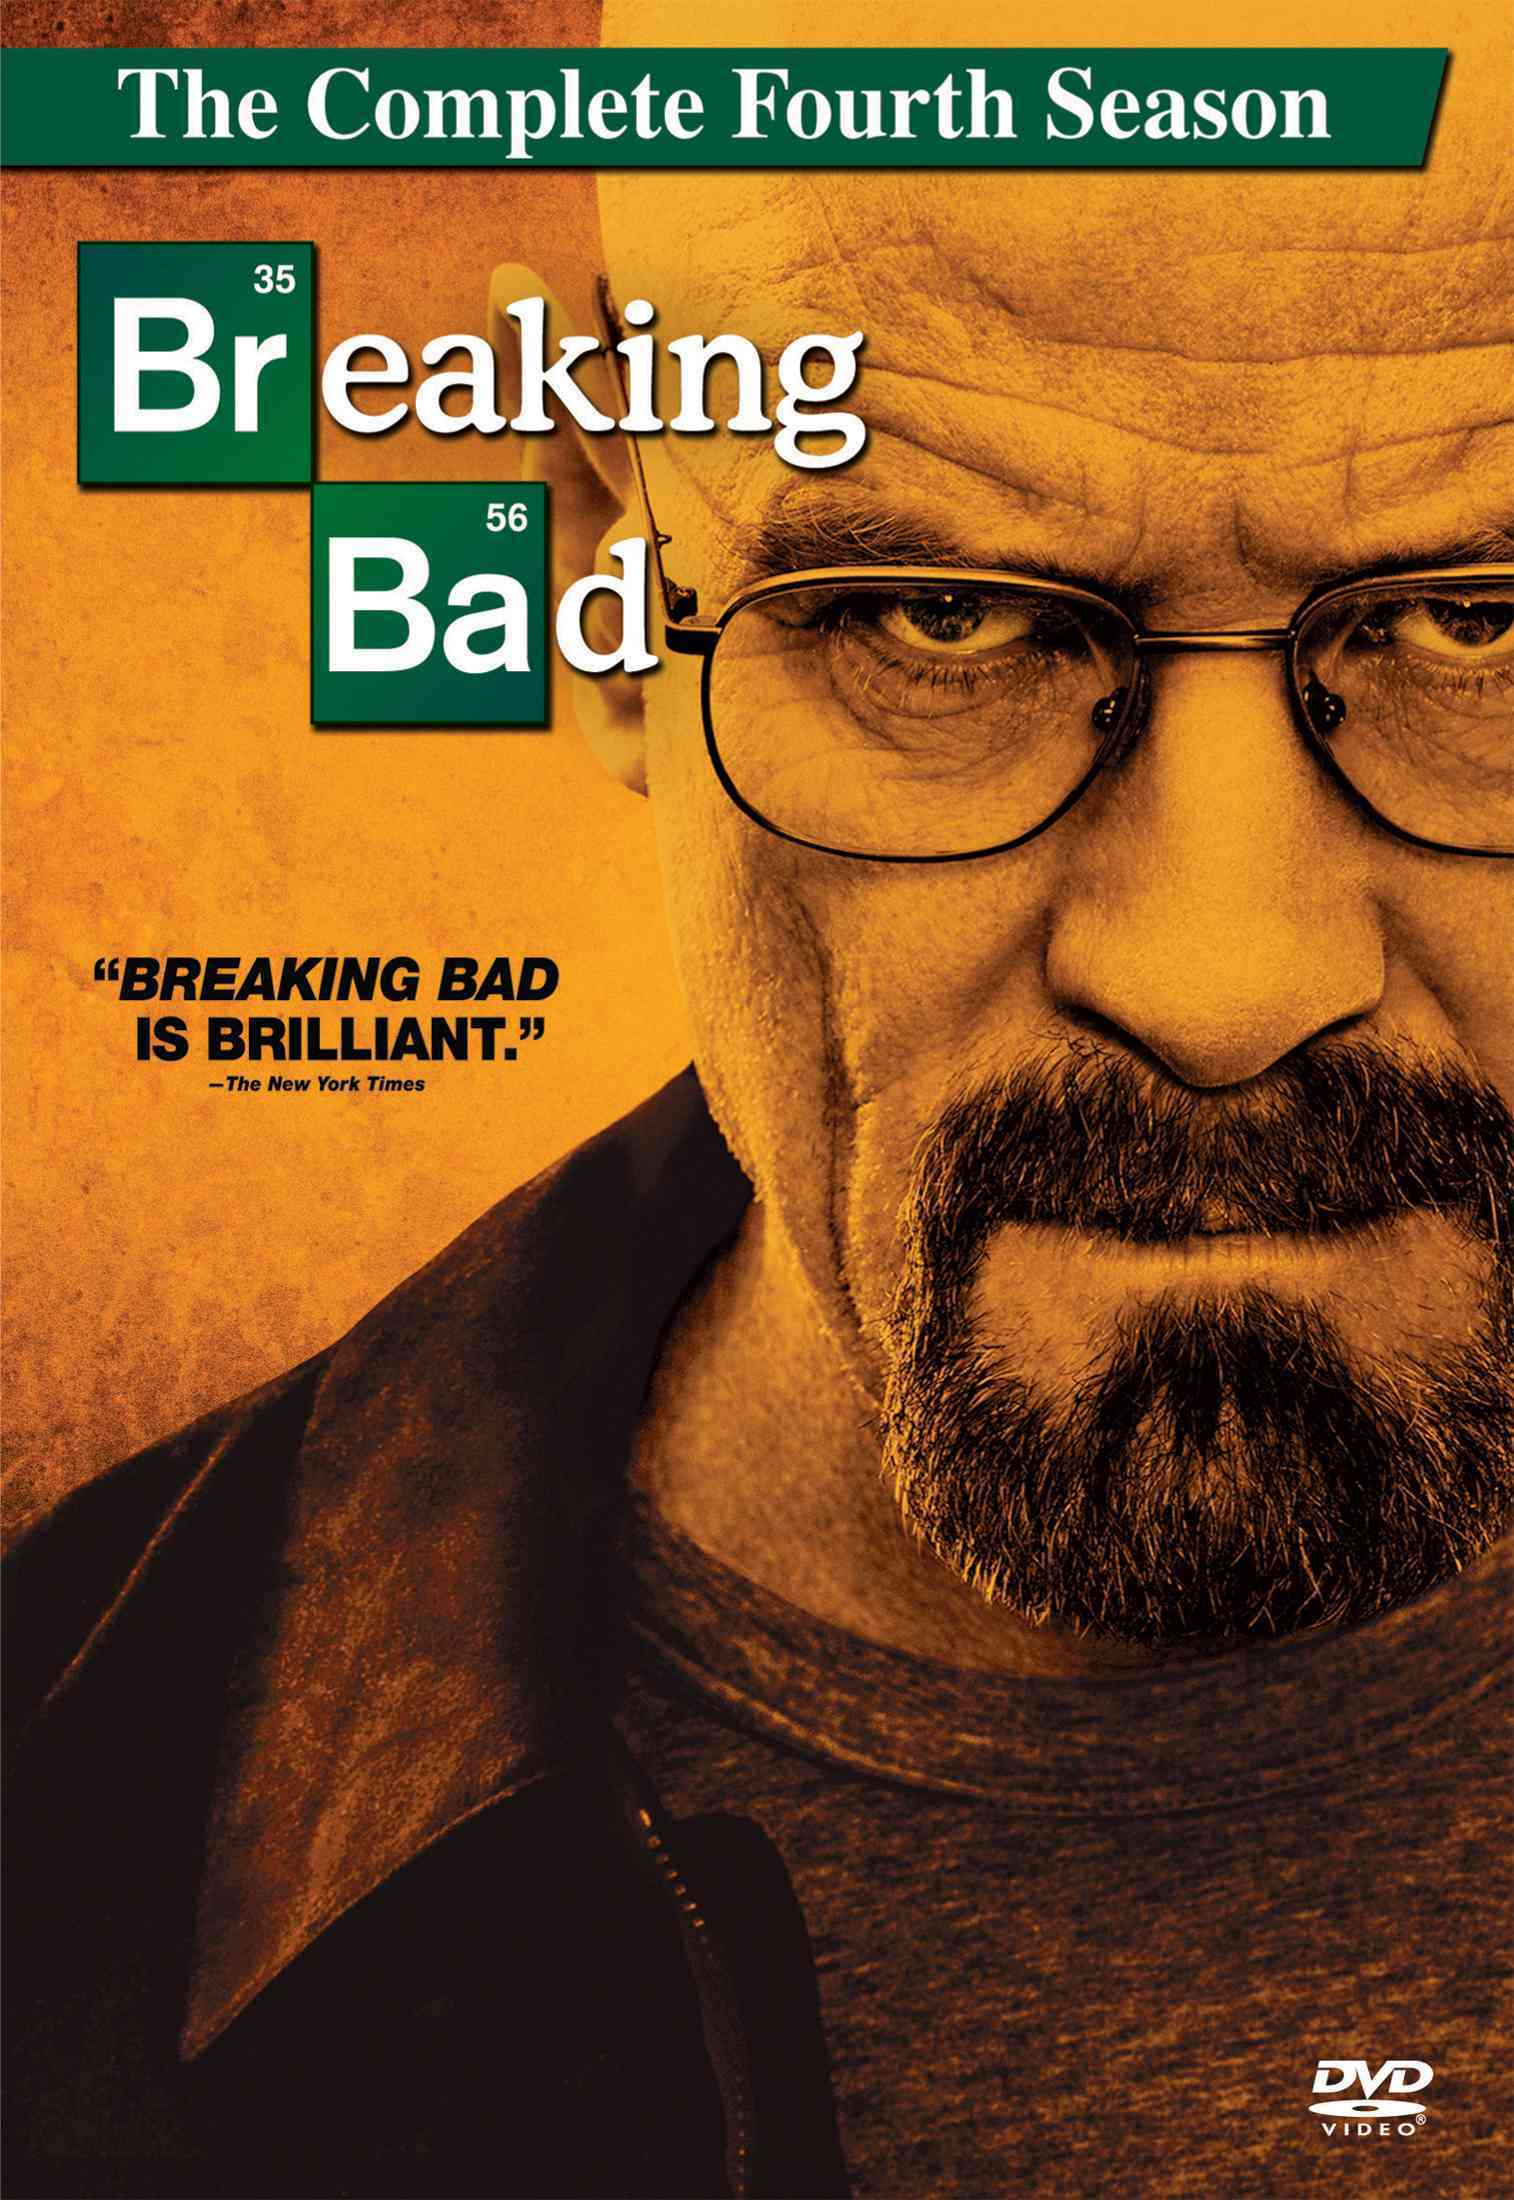 BREAKING BAD:COMPLETE FOURTH SEASON BY CRANSTON,BRYAN (DVD)